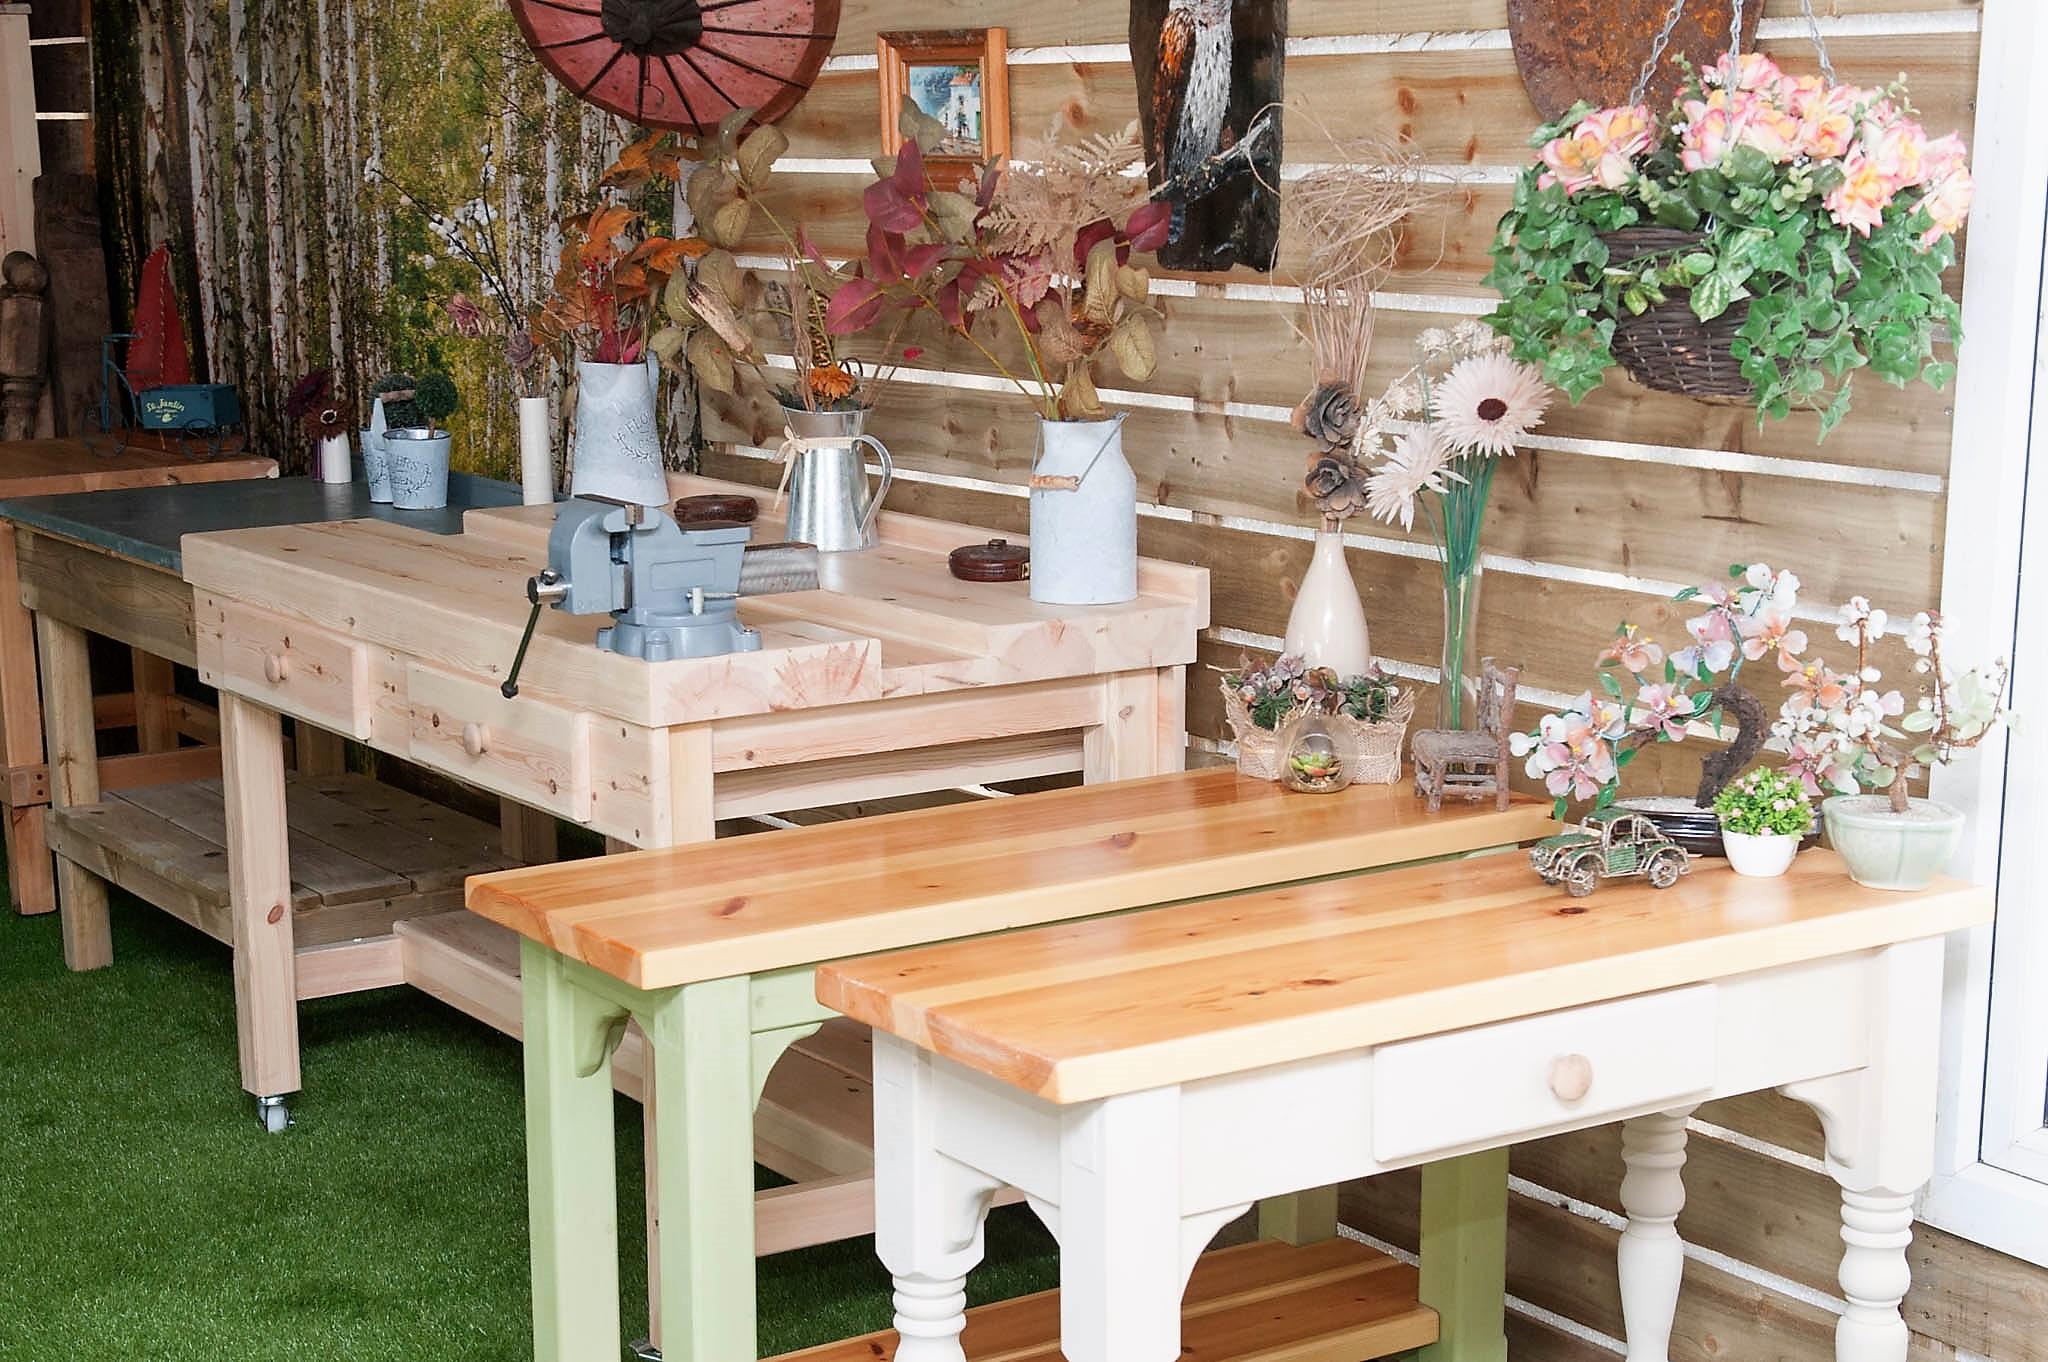 Wooden Workbench Driffield